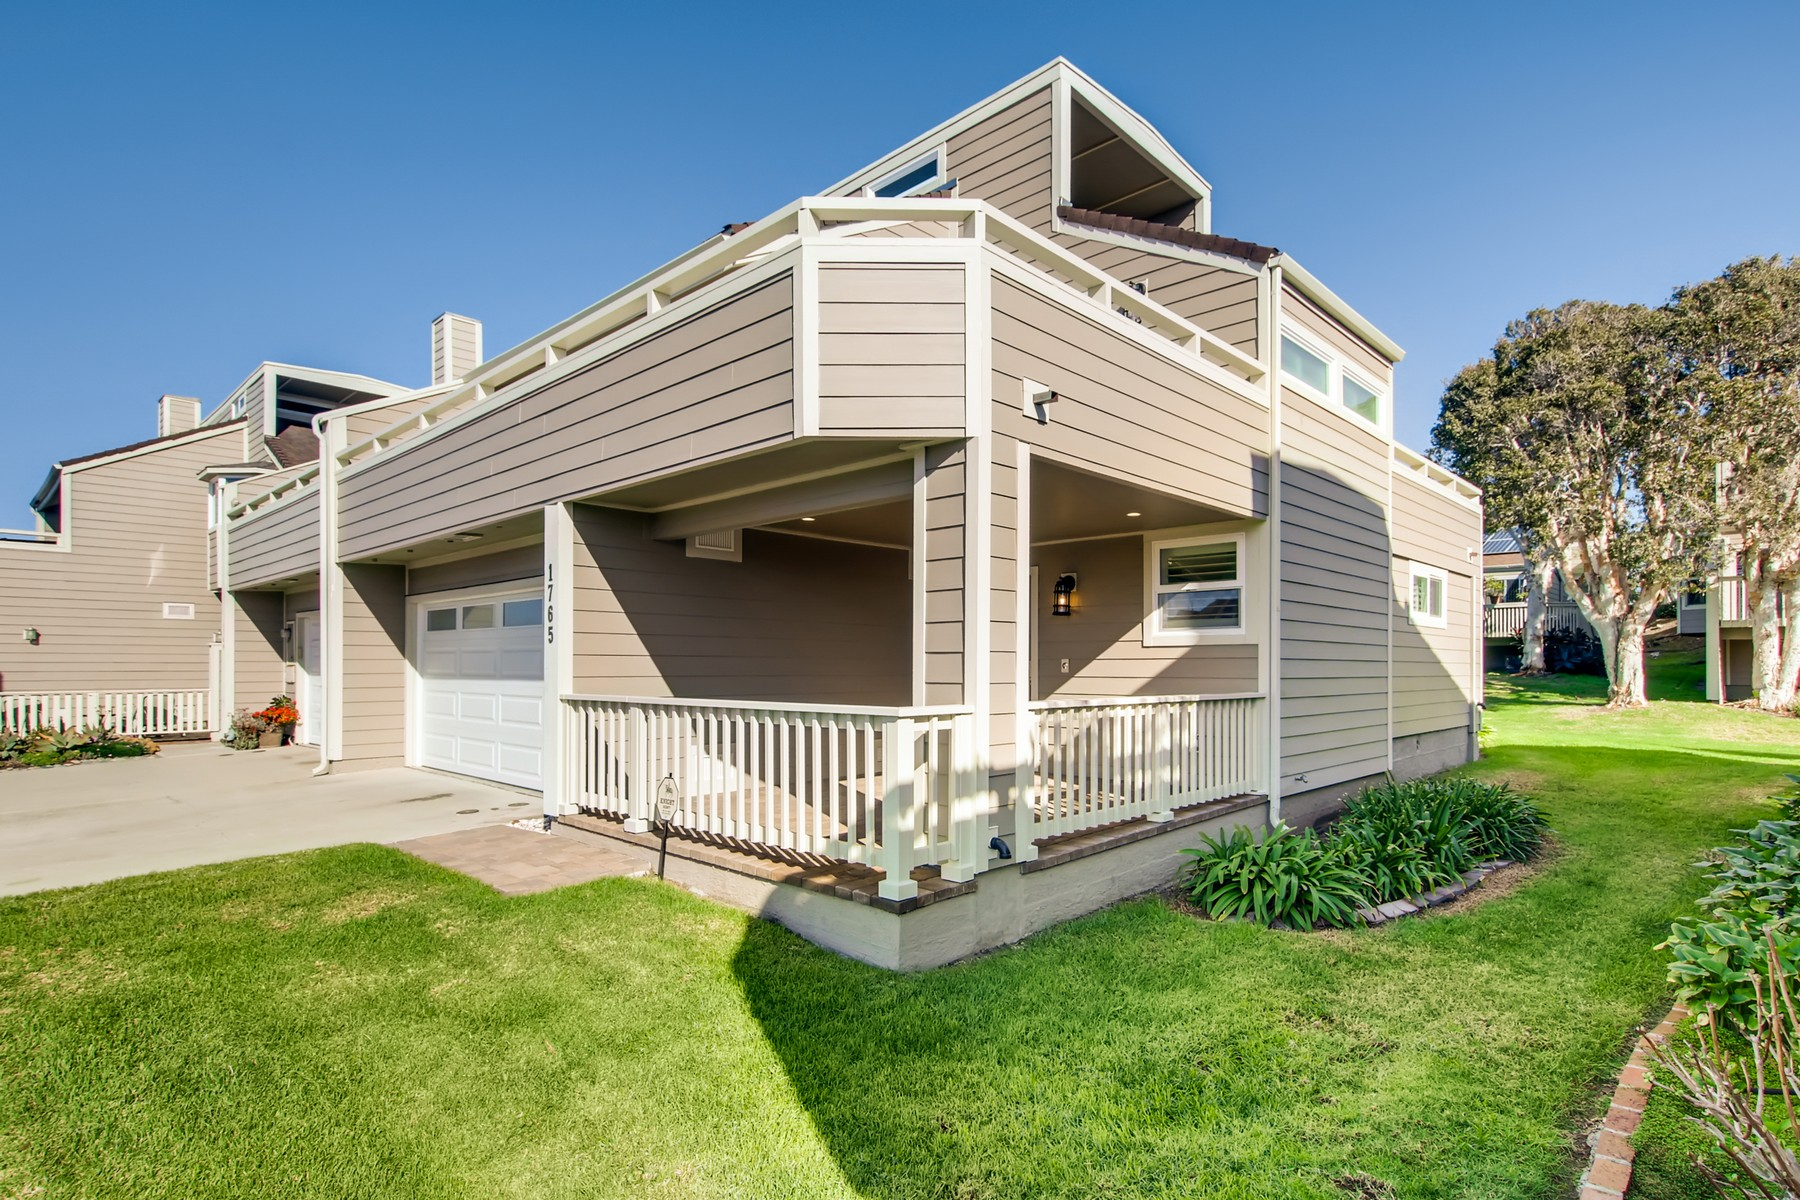 Property for Sale at Ocean View Paradise 1765 Tattenham Rd. Encinitas, California 92024 United States